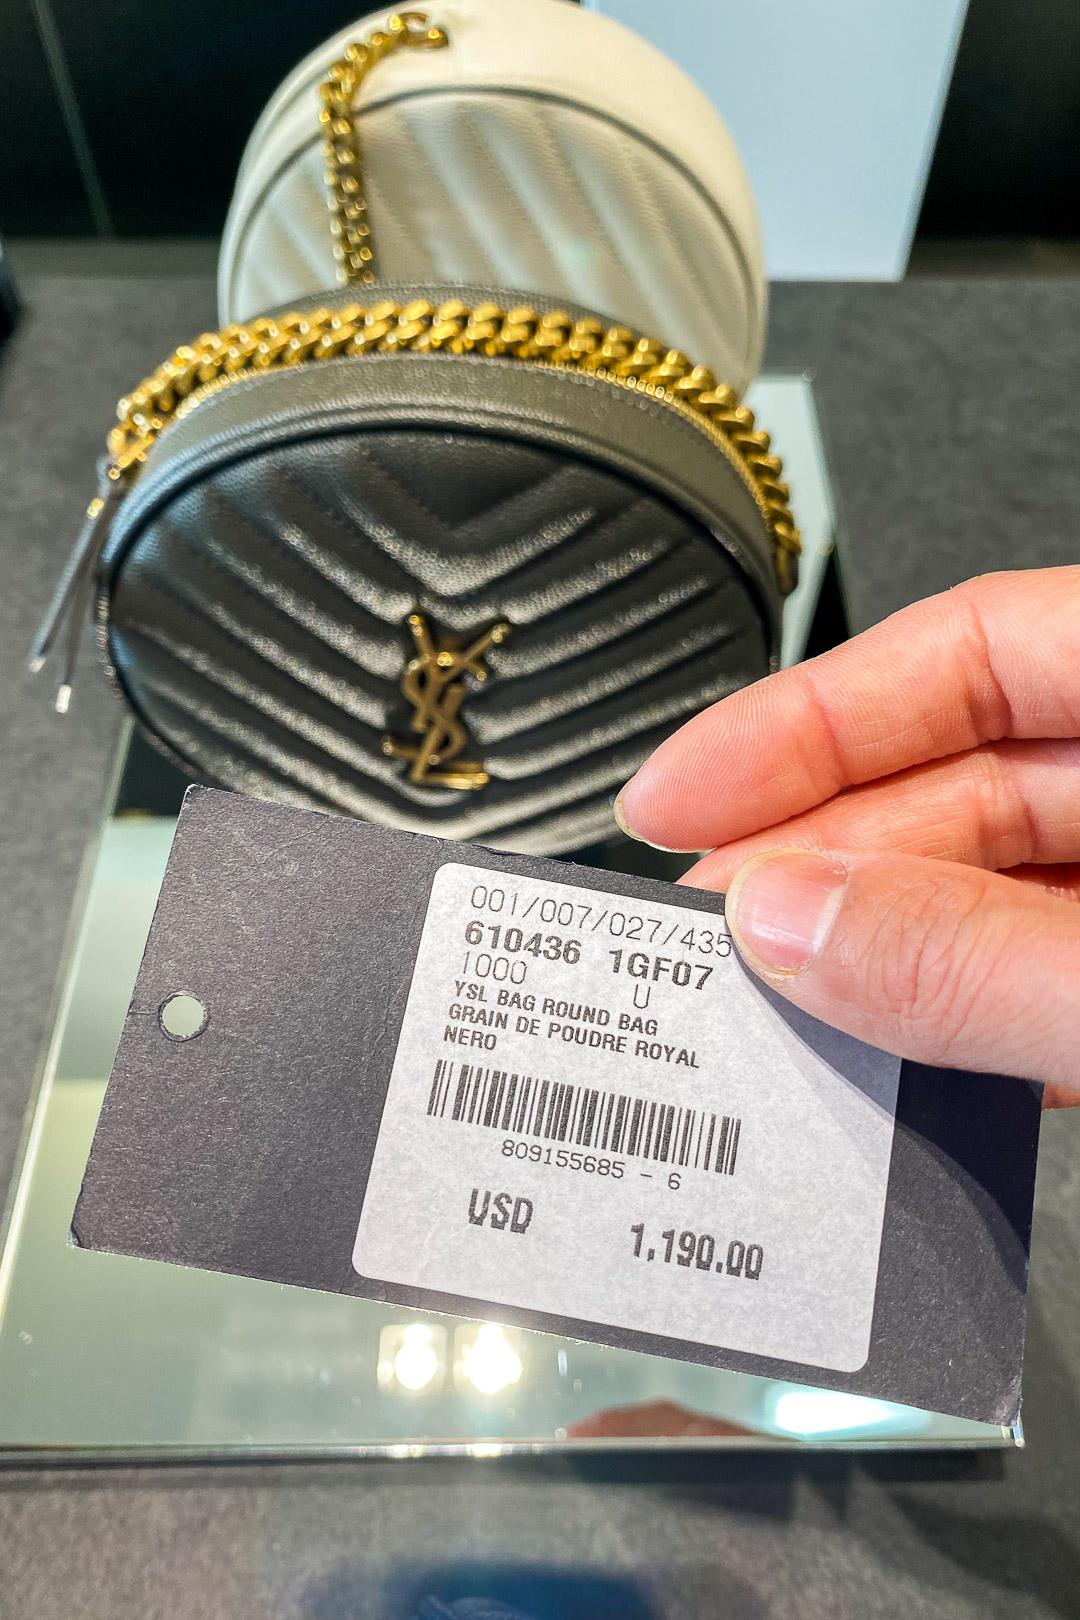 YSL Vinyle Round Camera Bag Price - Take 20% Off Sticker Price